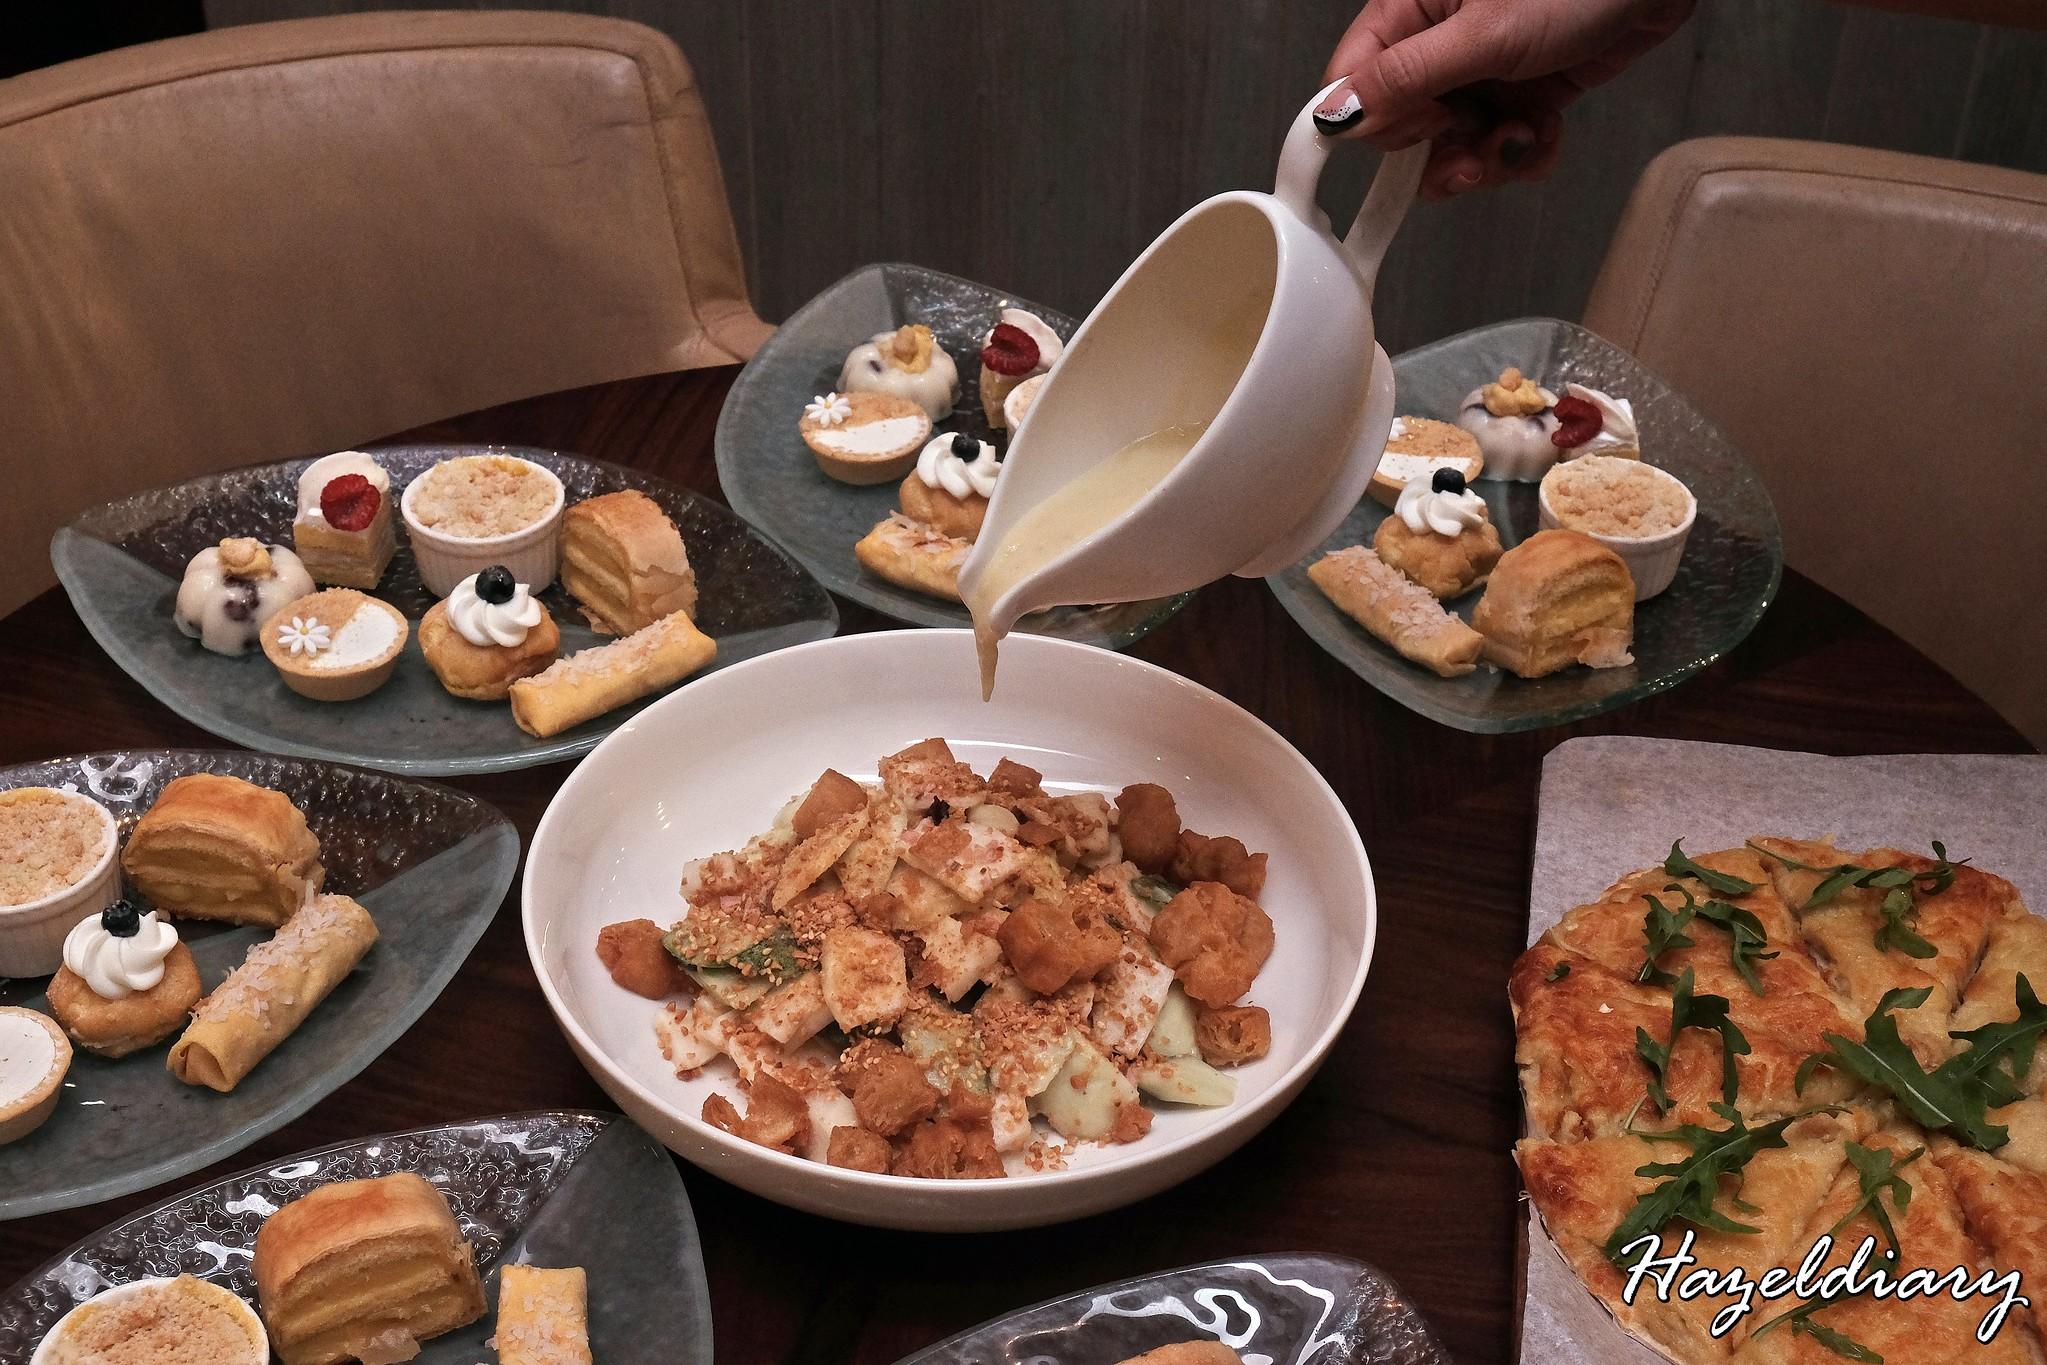 [SG EATS]2019 Durian High Tea Buffet At Singapore Marriott Tang Plaza Hotel